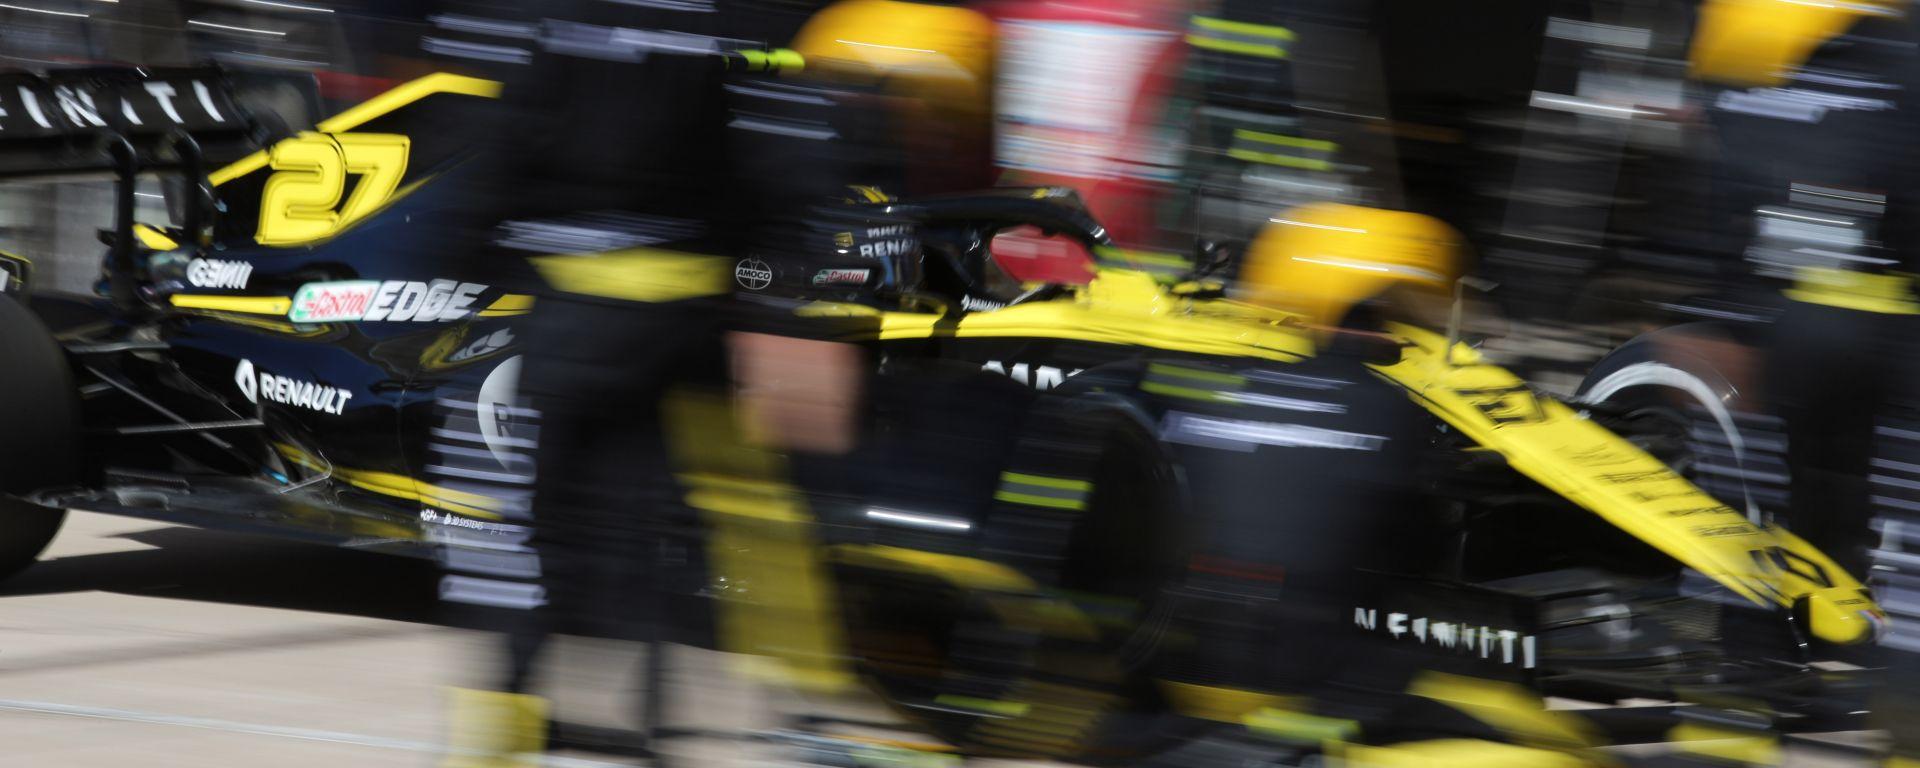 F1 GP USA 2019, Austin: Nico Hulkenberg (Renault)